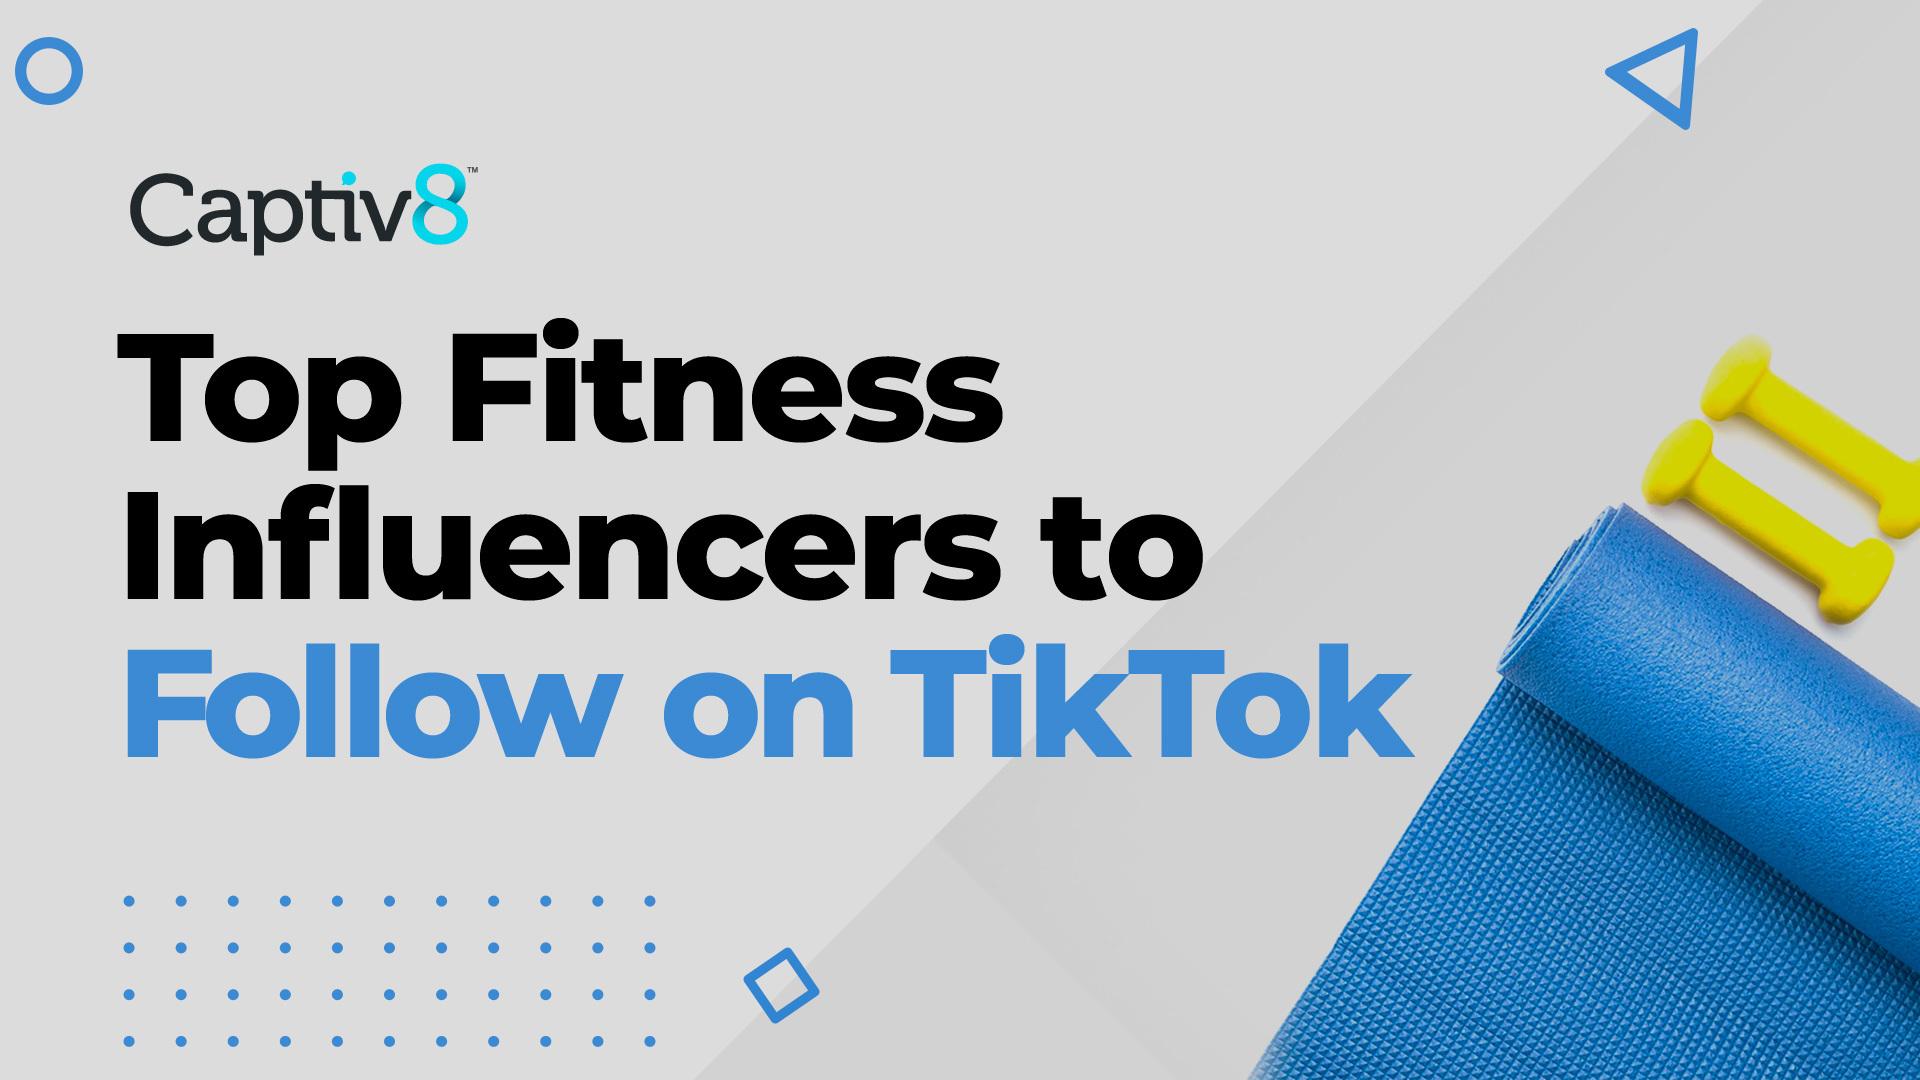 Top Fitness Influencers to Follow on TikTok